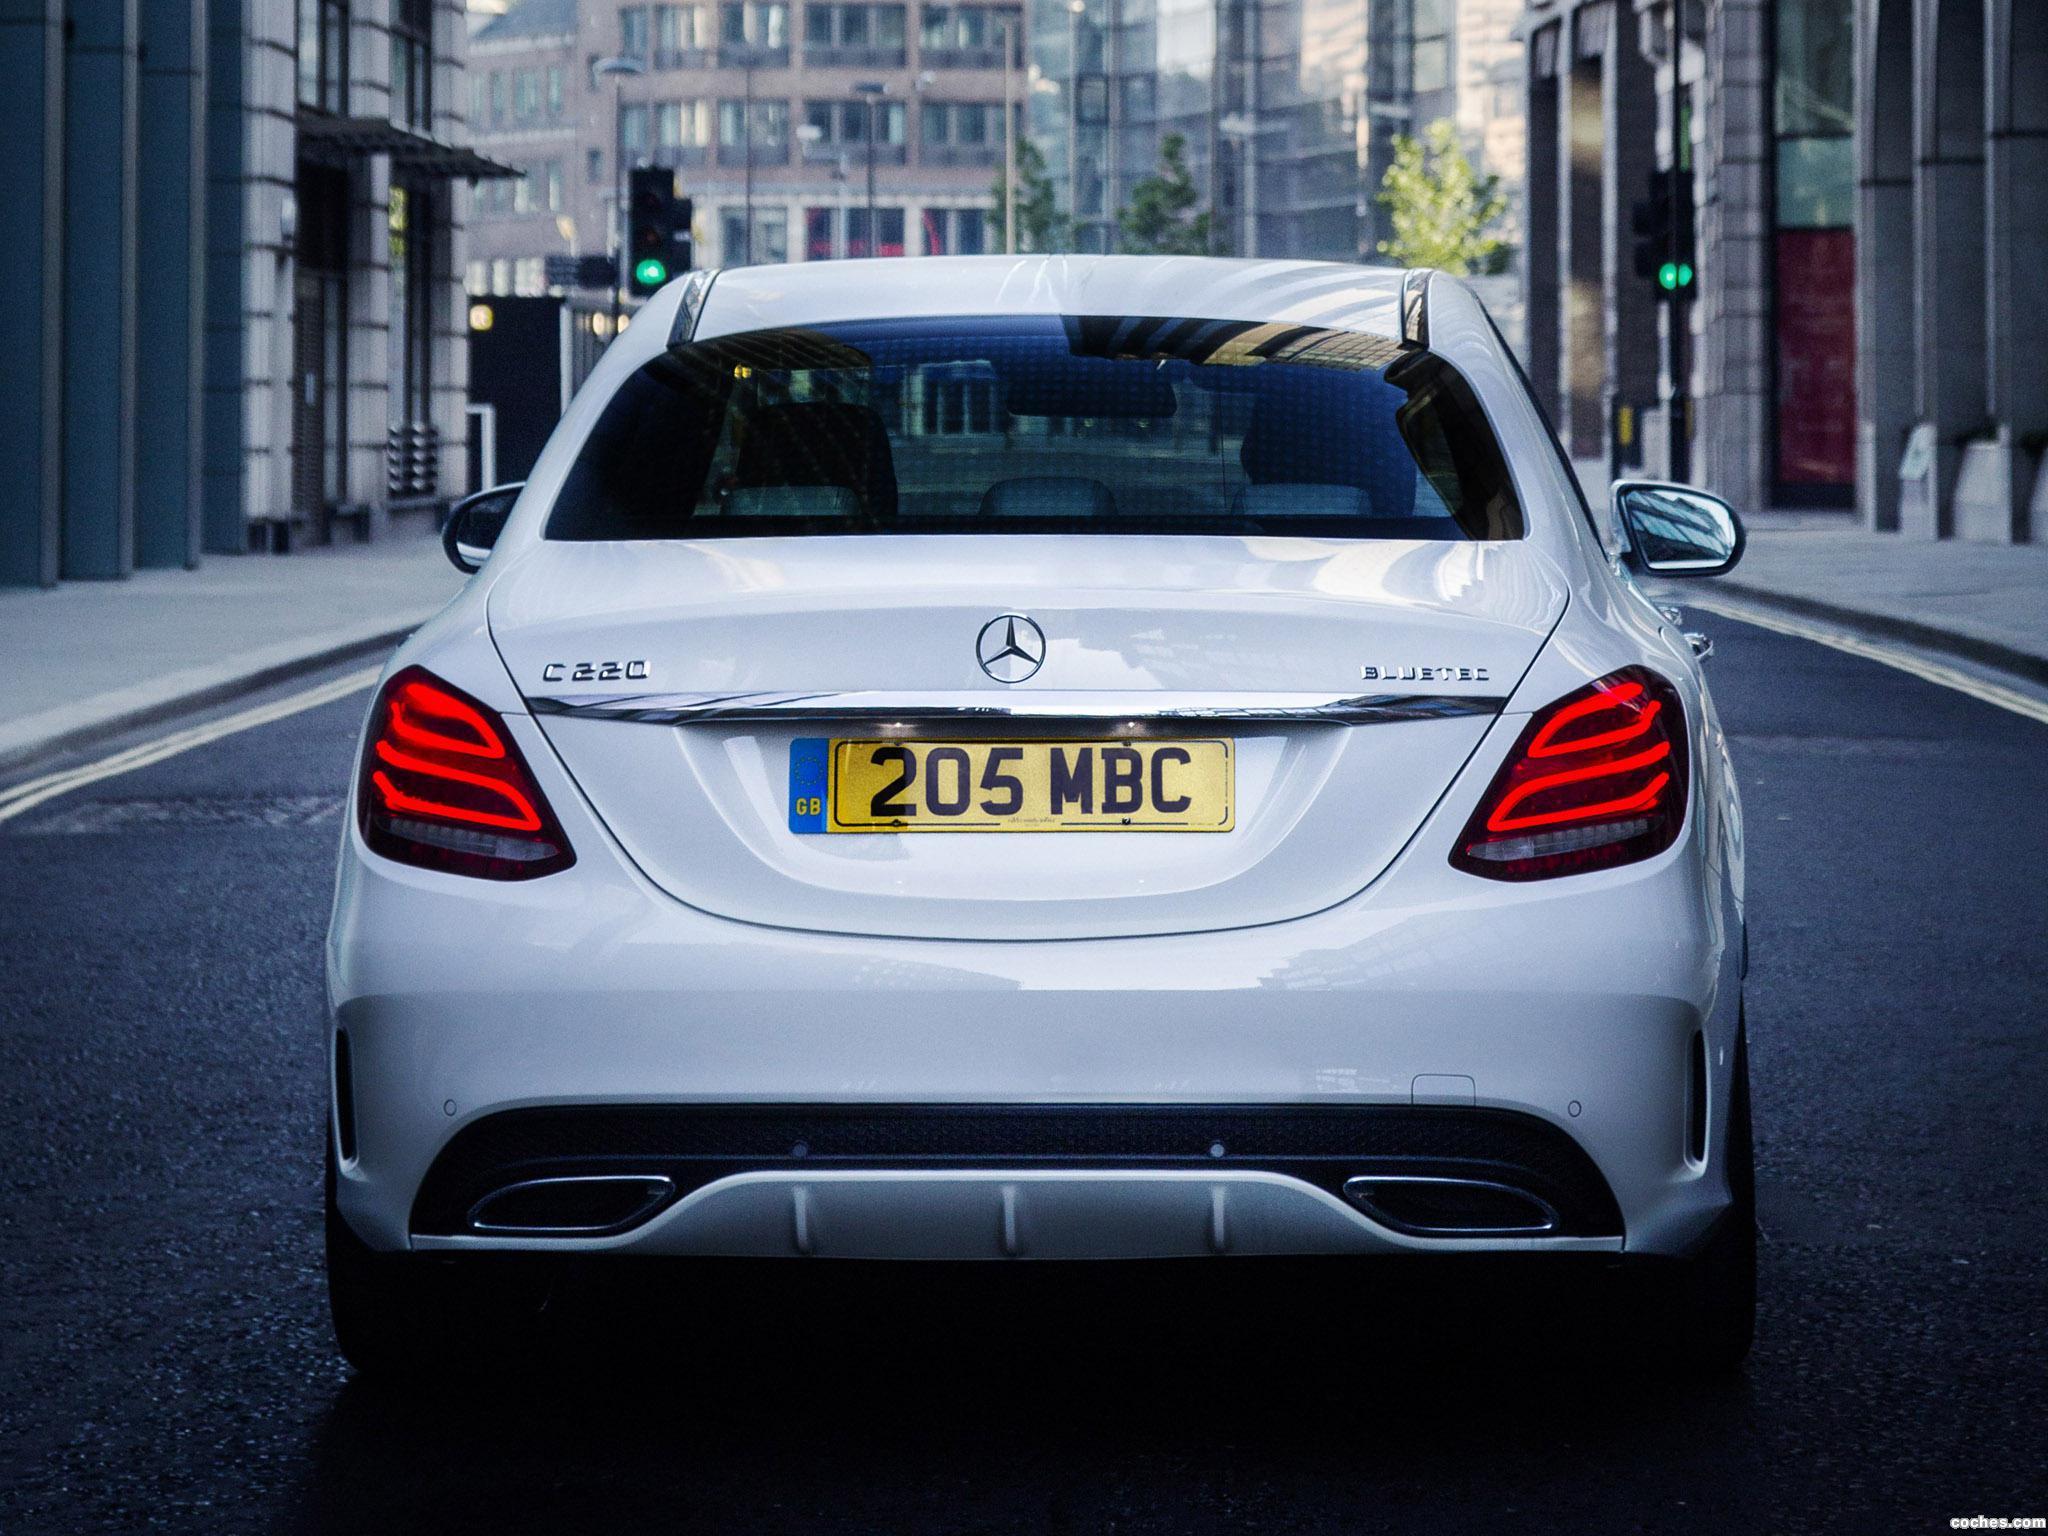 2014 Mercedes william hills online sports betting C Class Sports